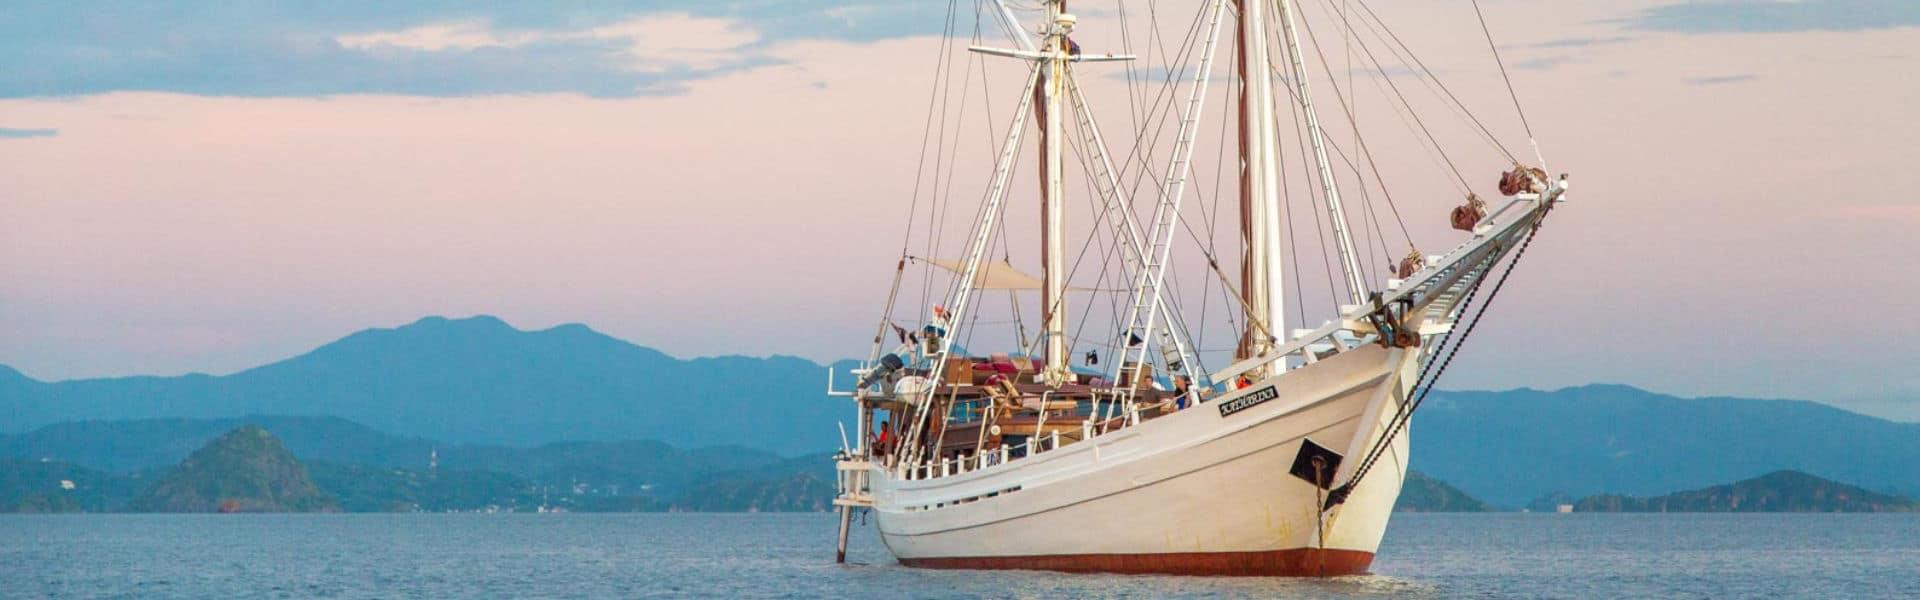 Borneo Komodo Cruise